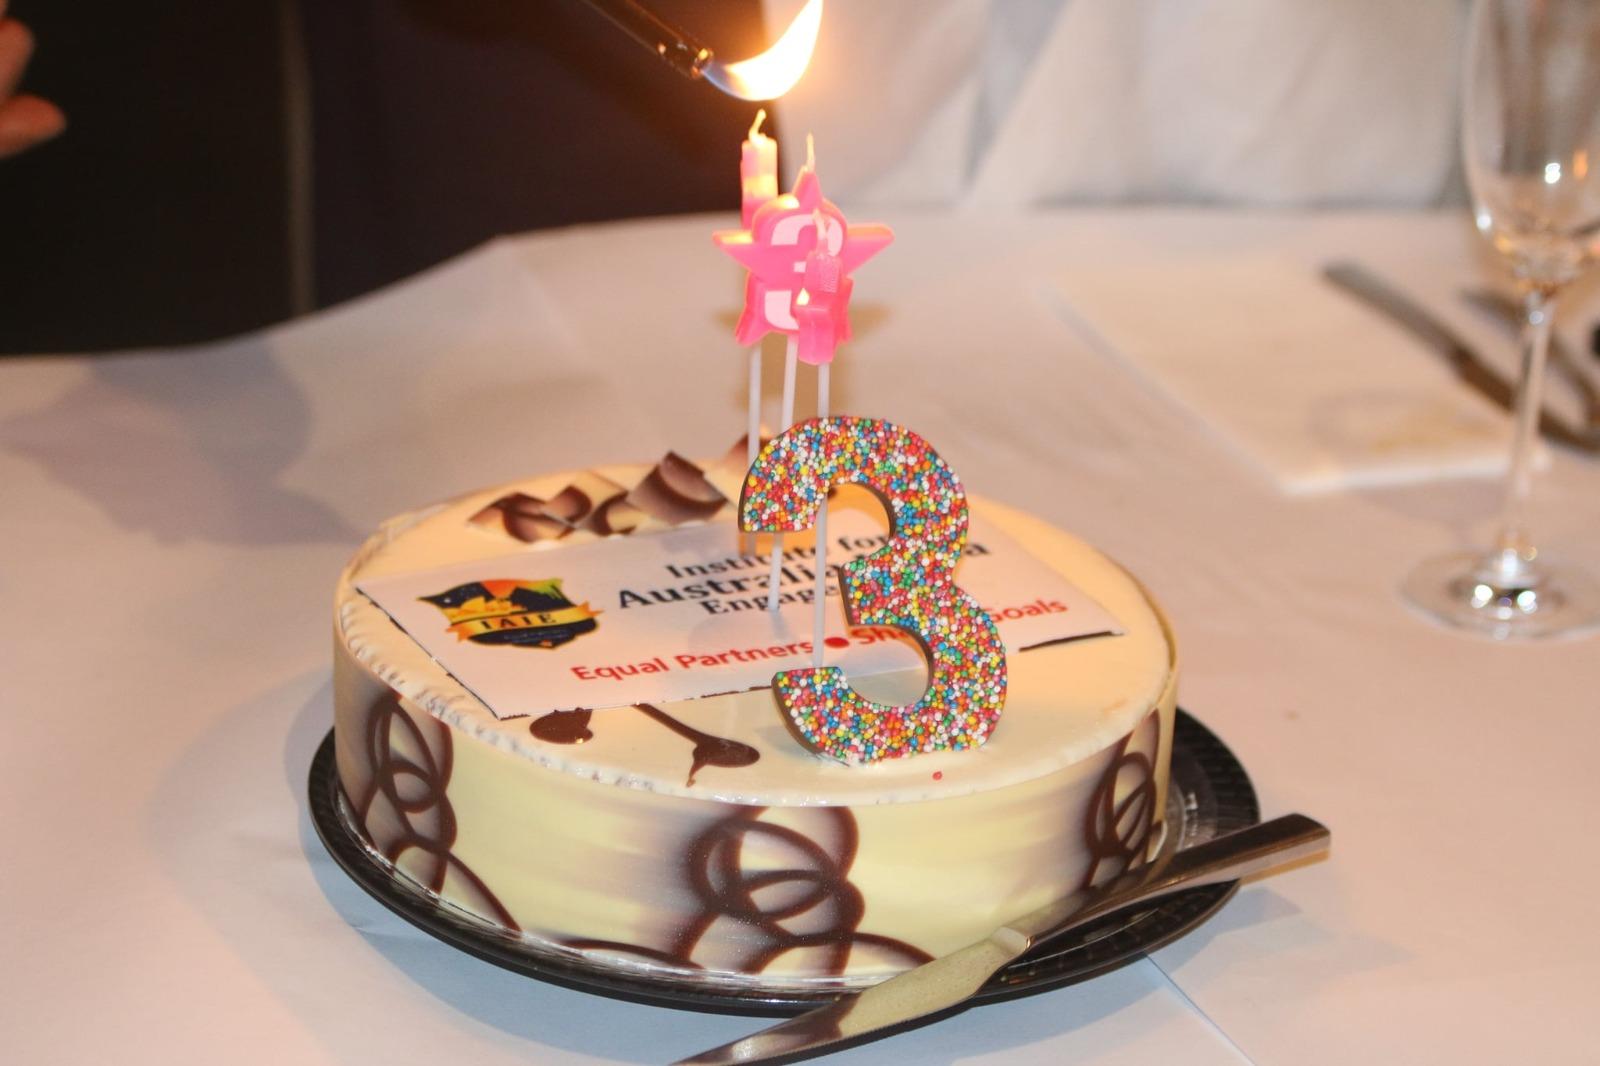 IAIE Celebrates 3rd Foundation Day